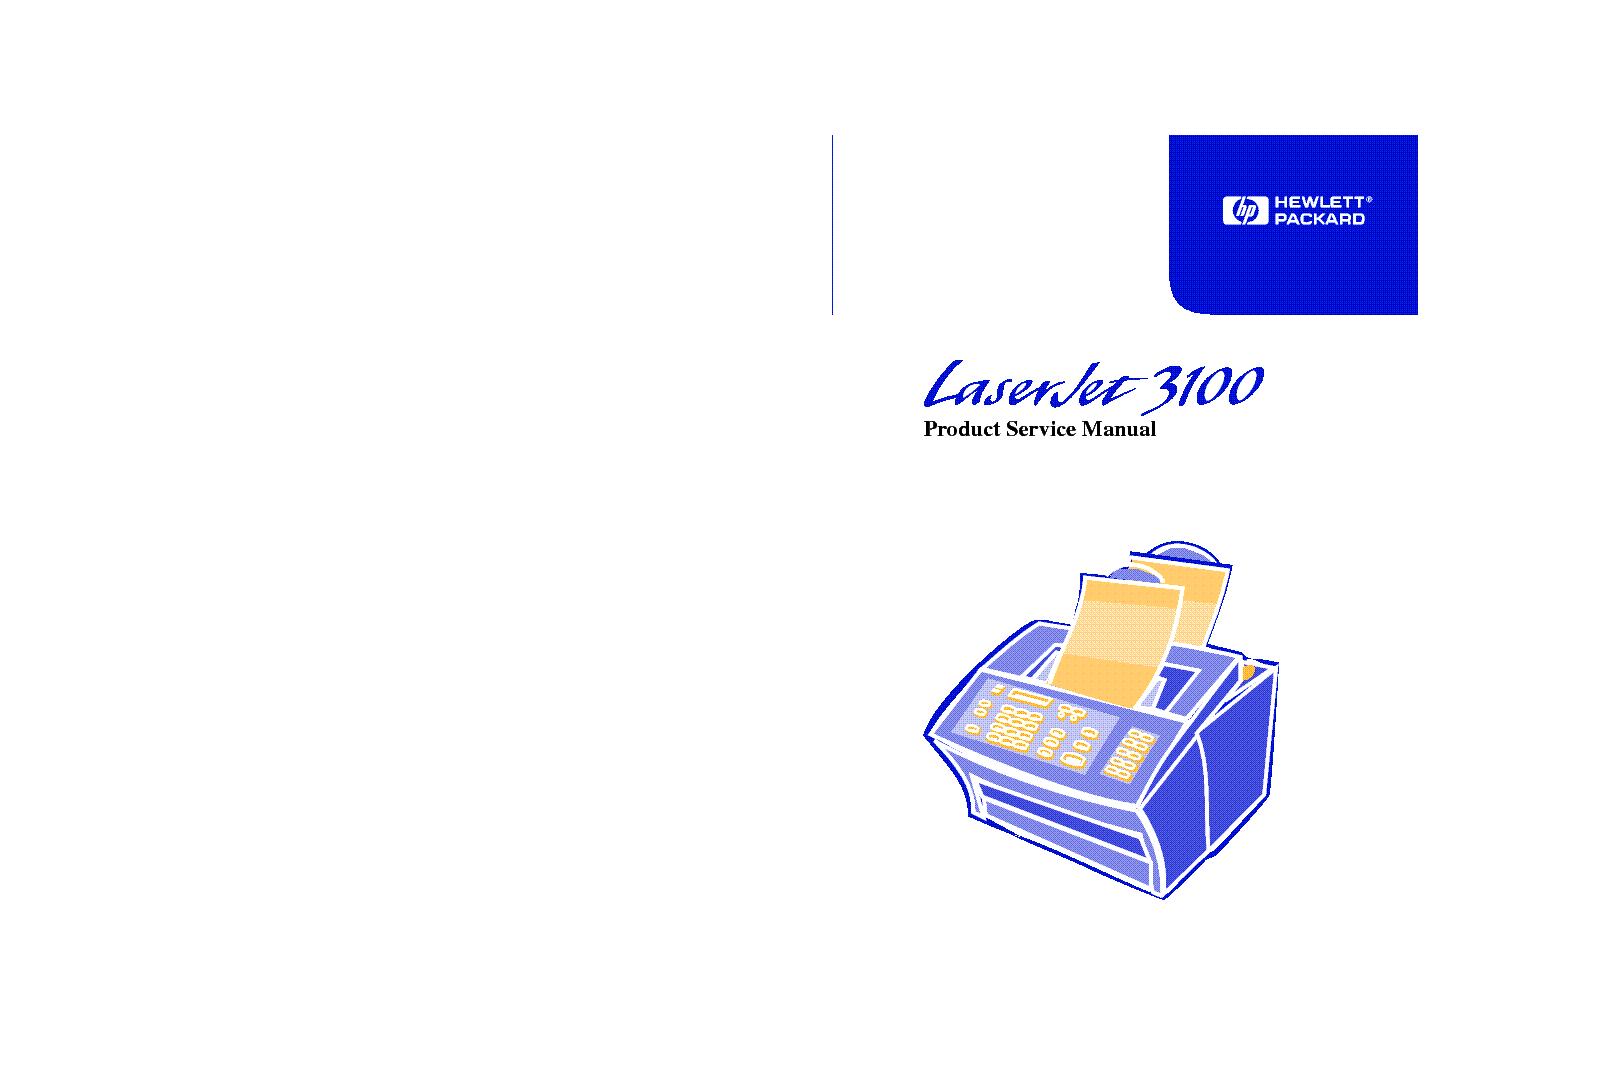 HP LJ3100 SERVICE MANUAL